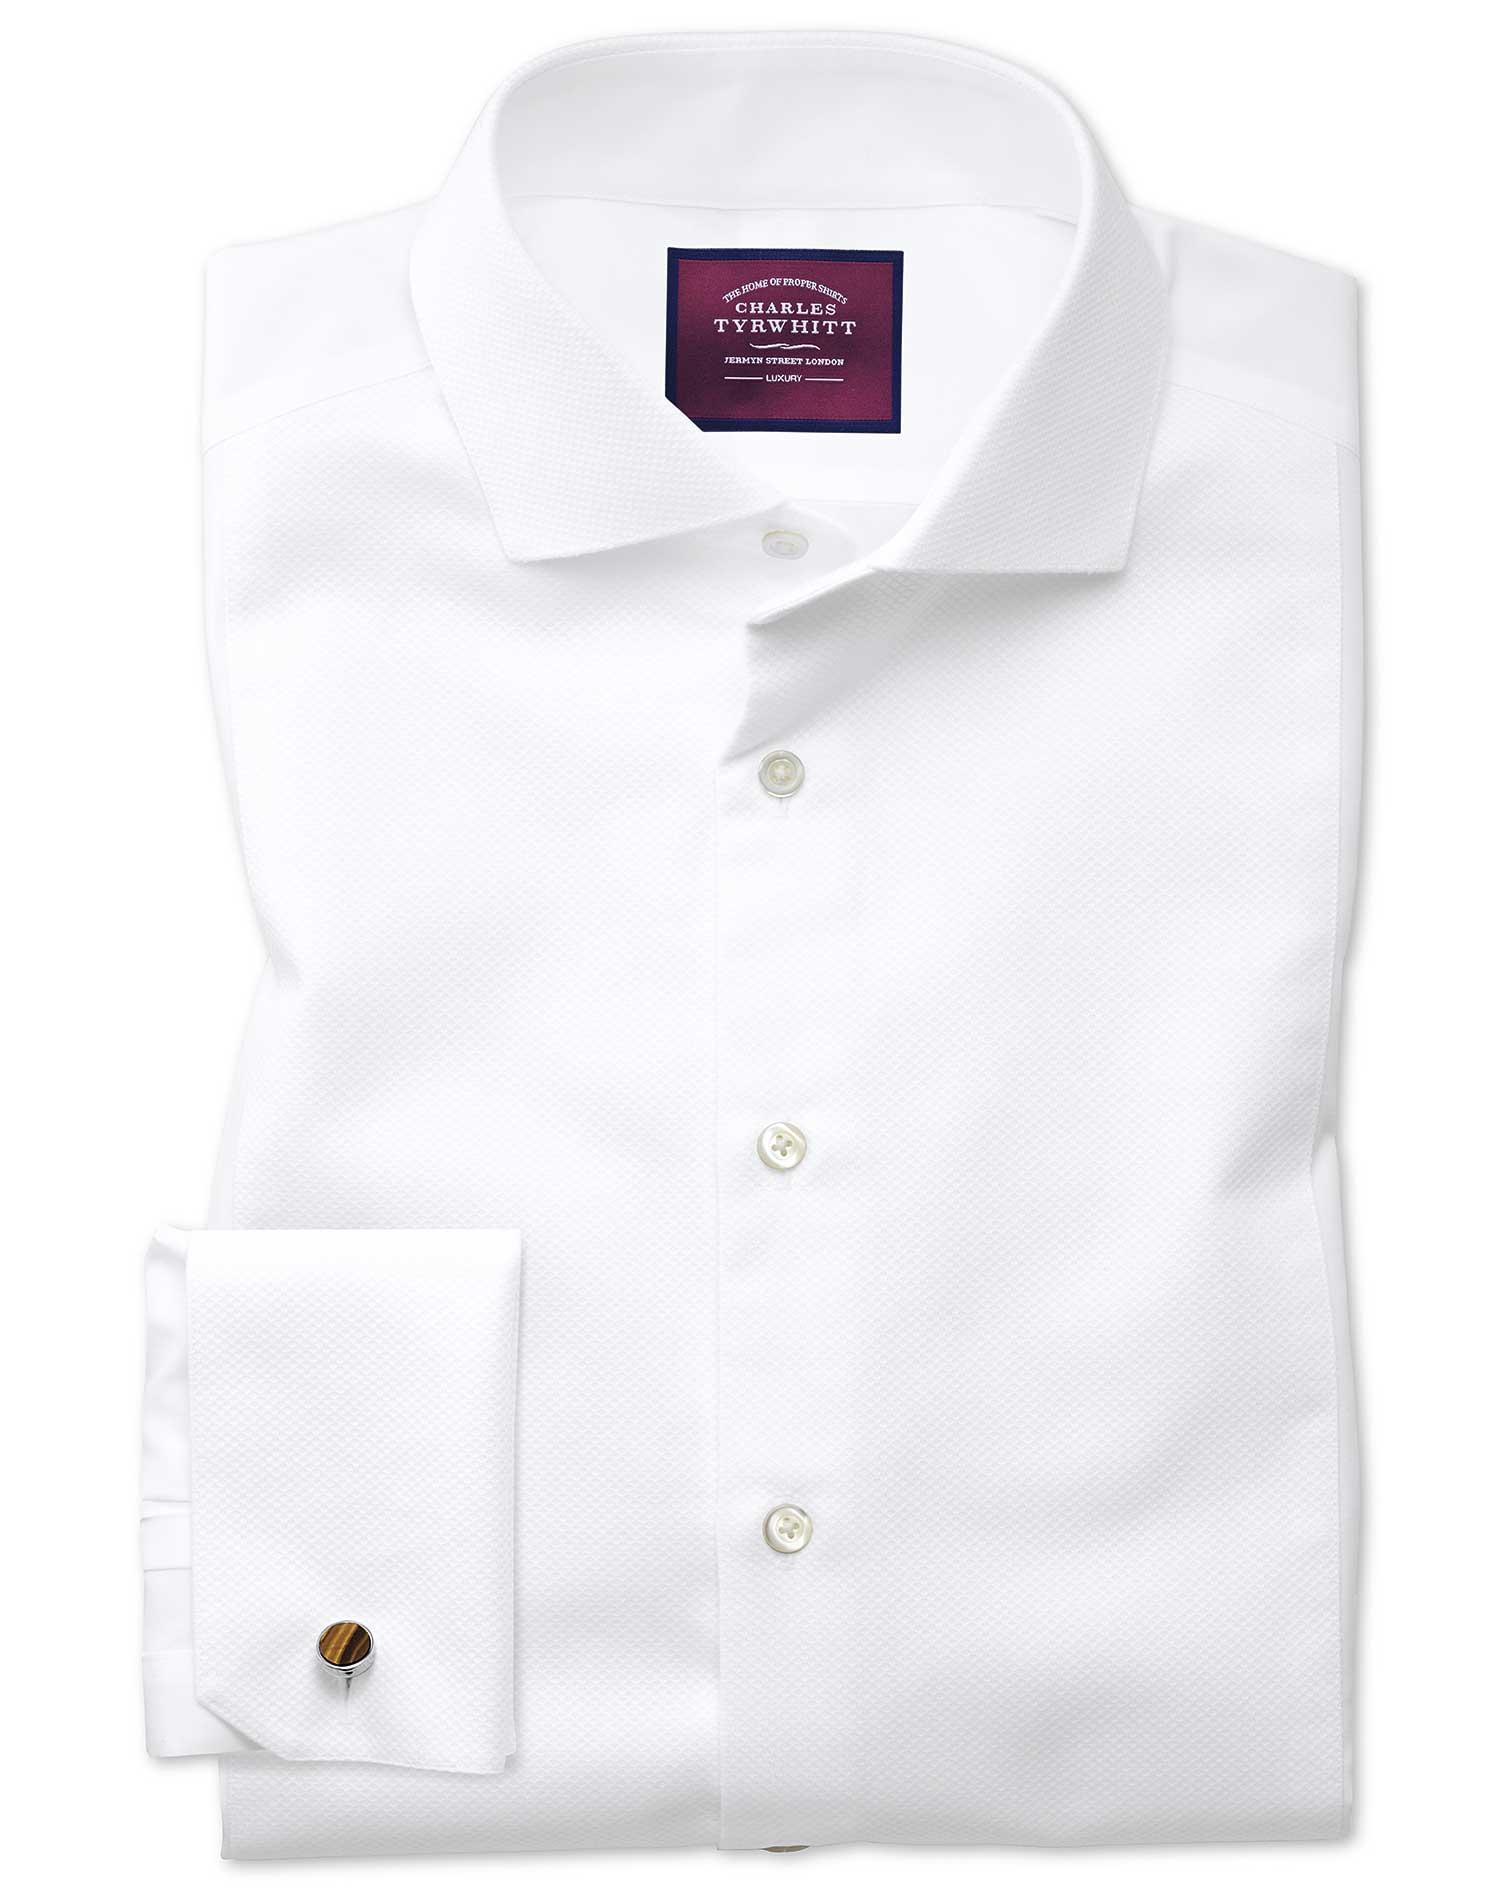 Slim Fit Cutaway Non-Iron Luxury Marcella Bib Front White Cotton Formal Shirt Double Cuff Size 15.5/